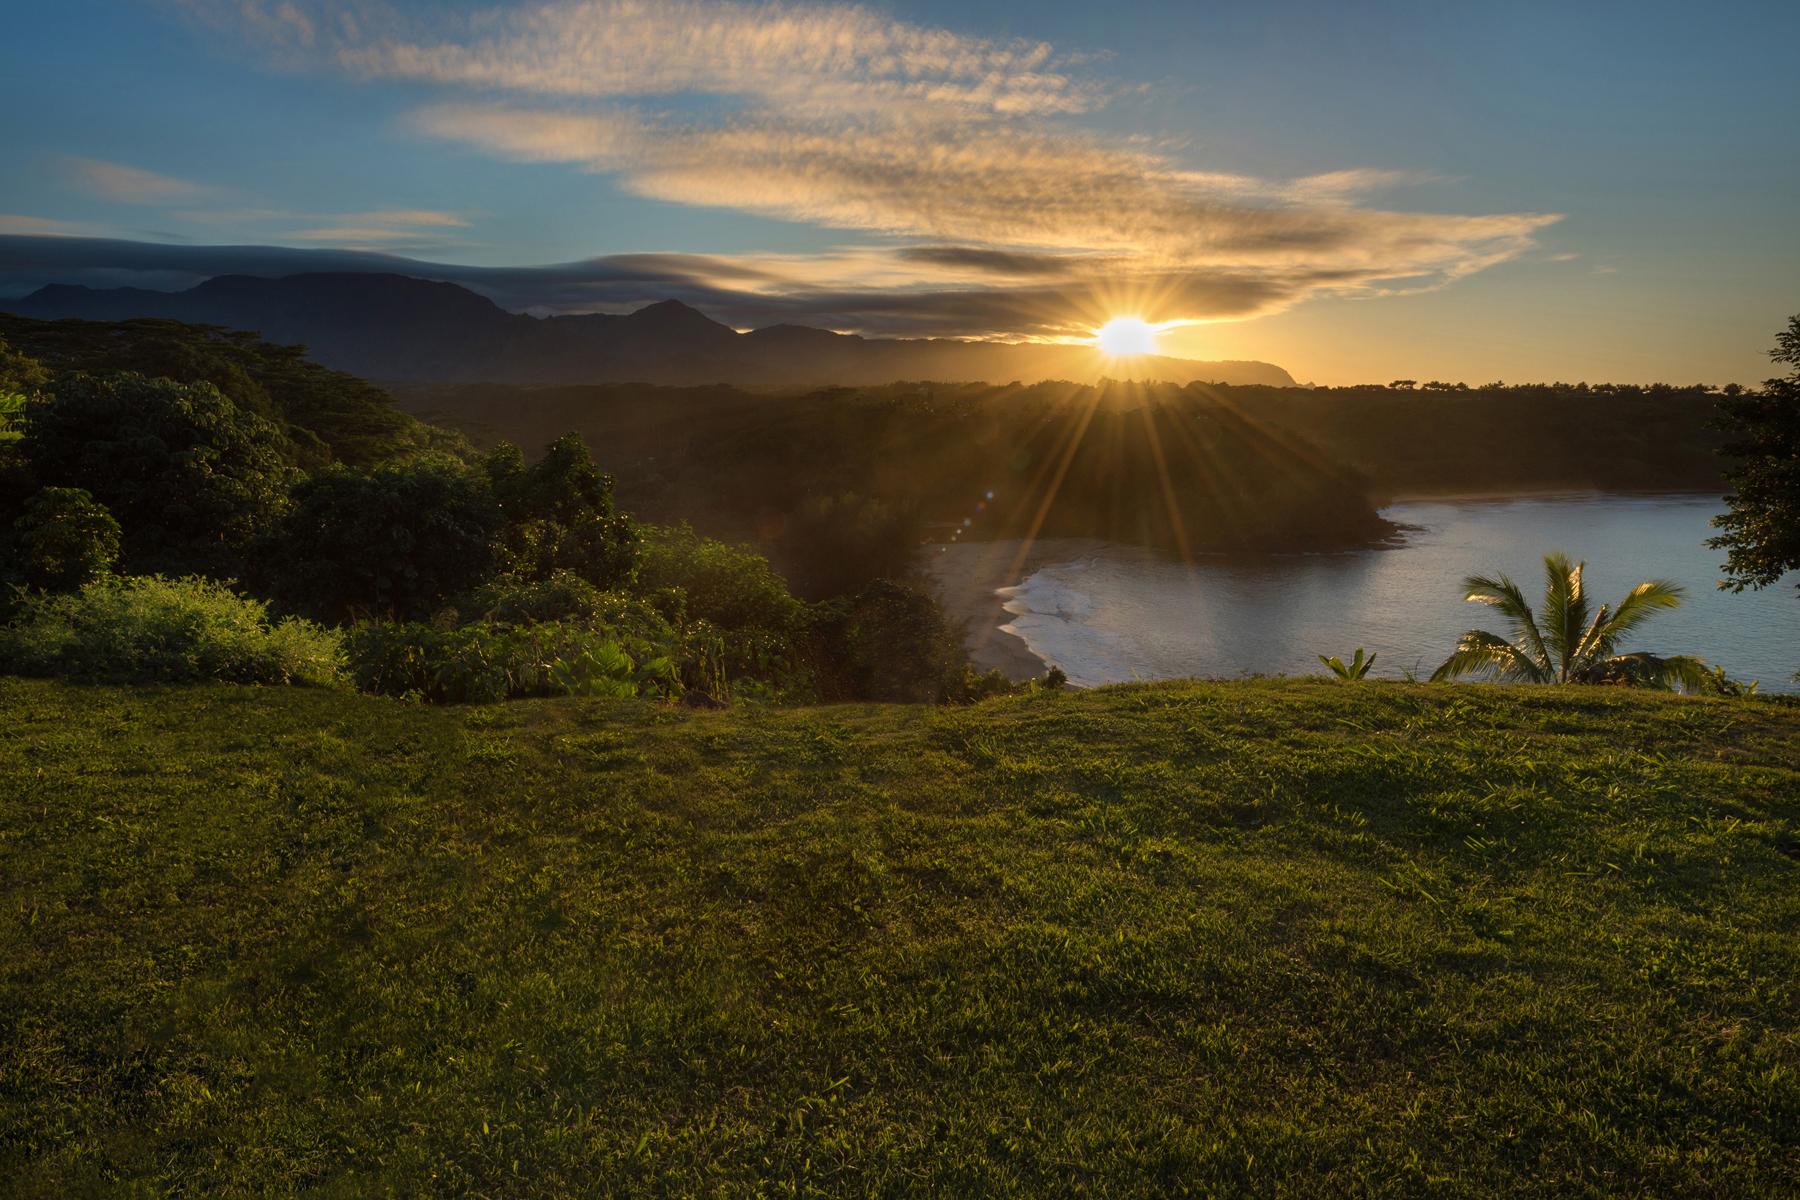 Đất đai vì Bán tại Kaohe Views 2991-C Kaohe Rd, #1 Kilauea, Hawaii, 96754 Hoa Kỳ